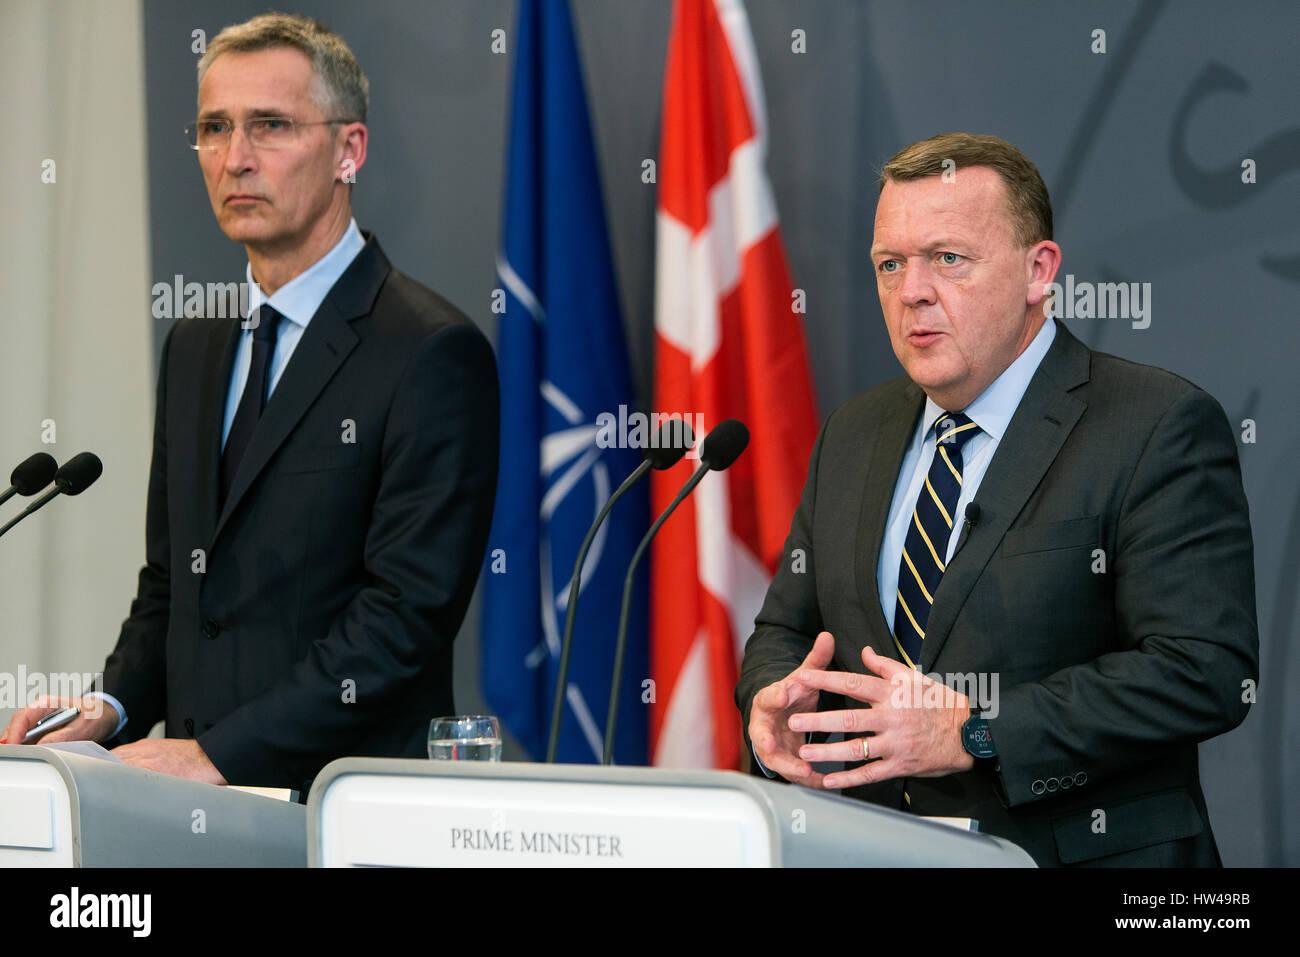 Danish Prime Minister Lars Lokke Rasmussen (R) speaks during a press conference together with NATO Secretary General - Stock Image